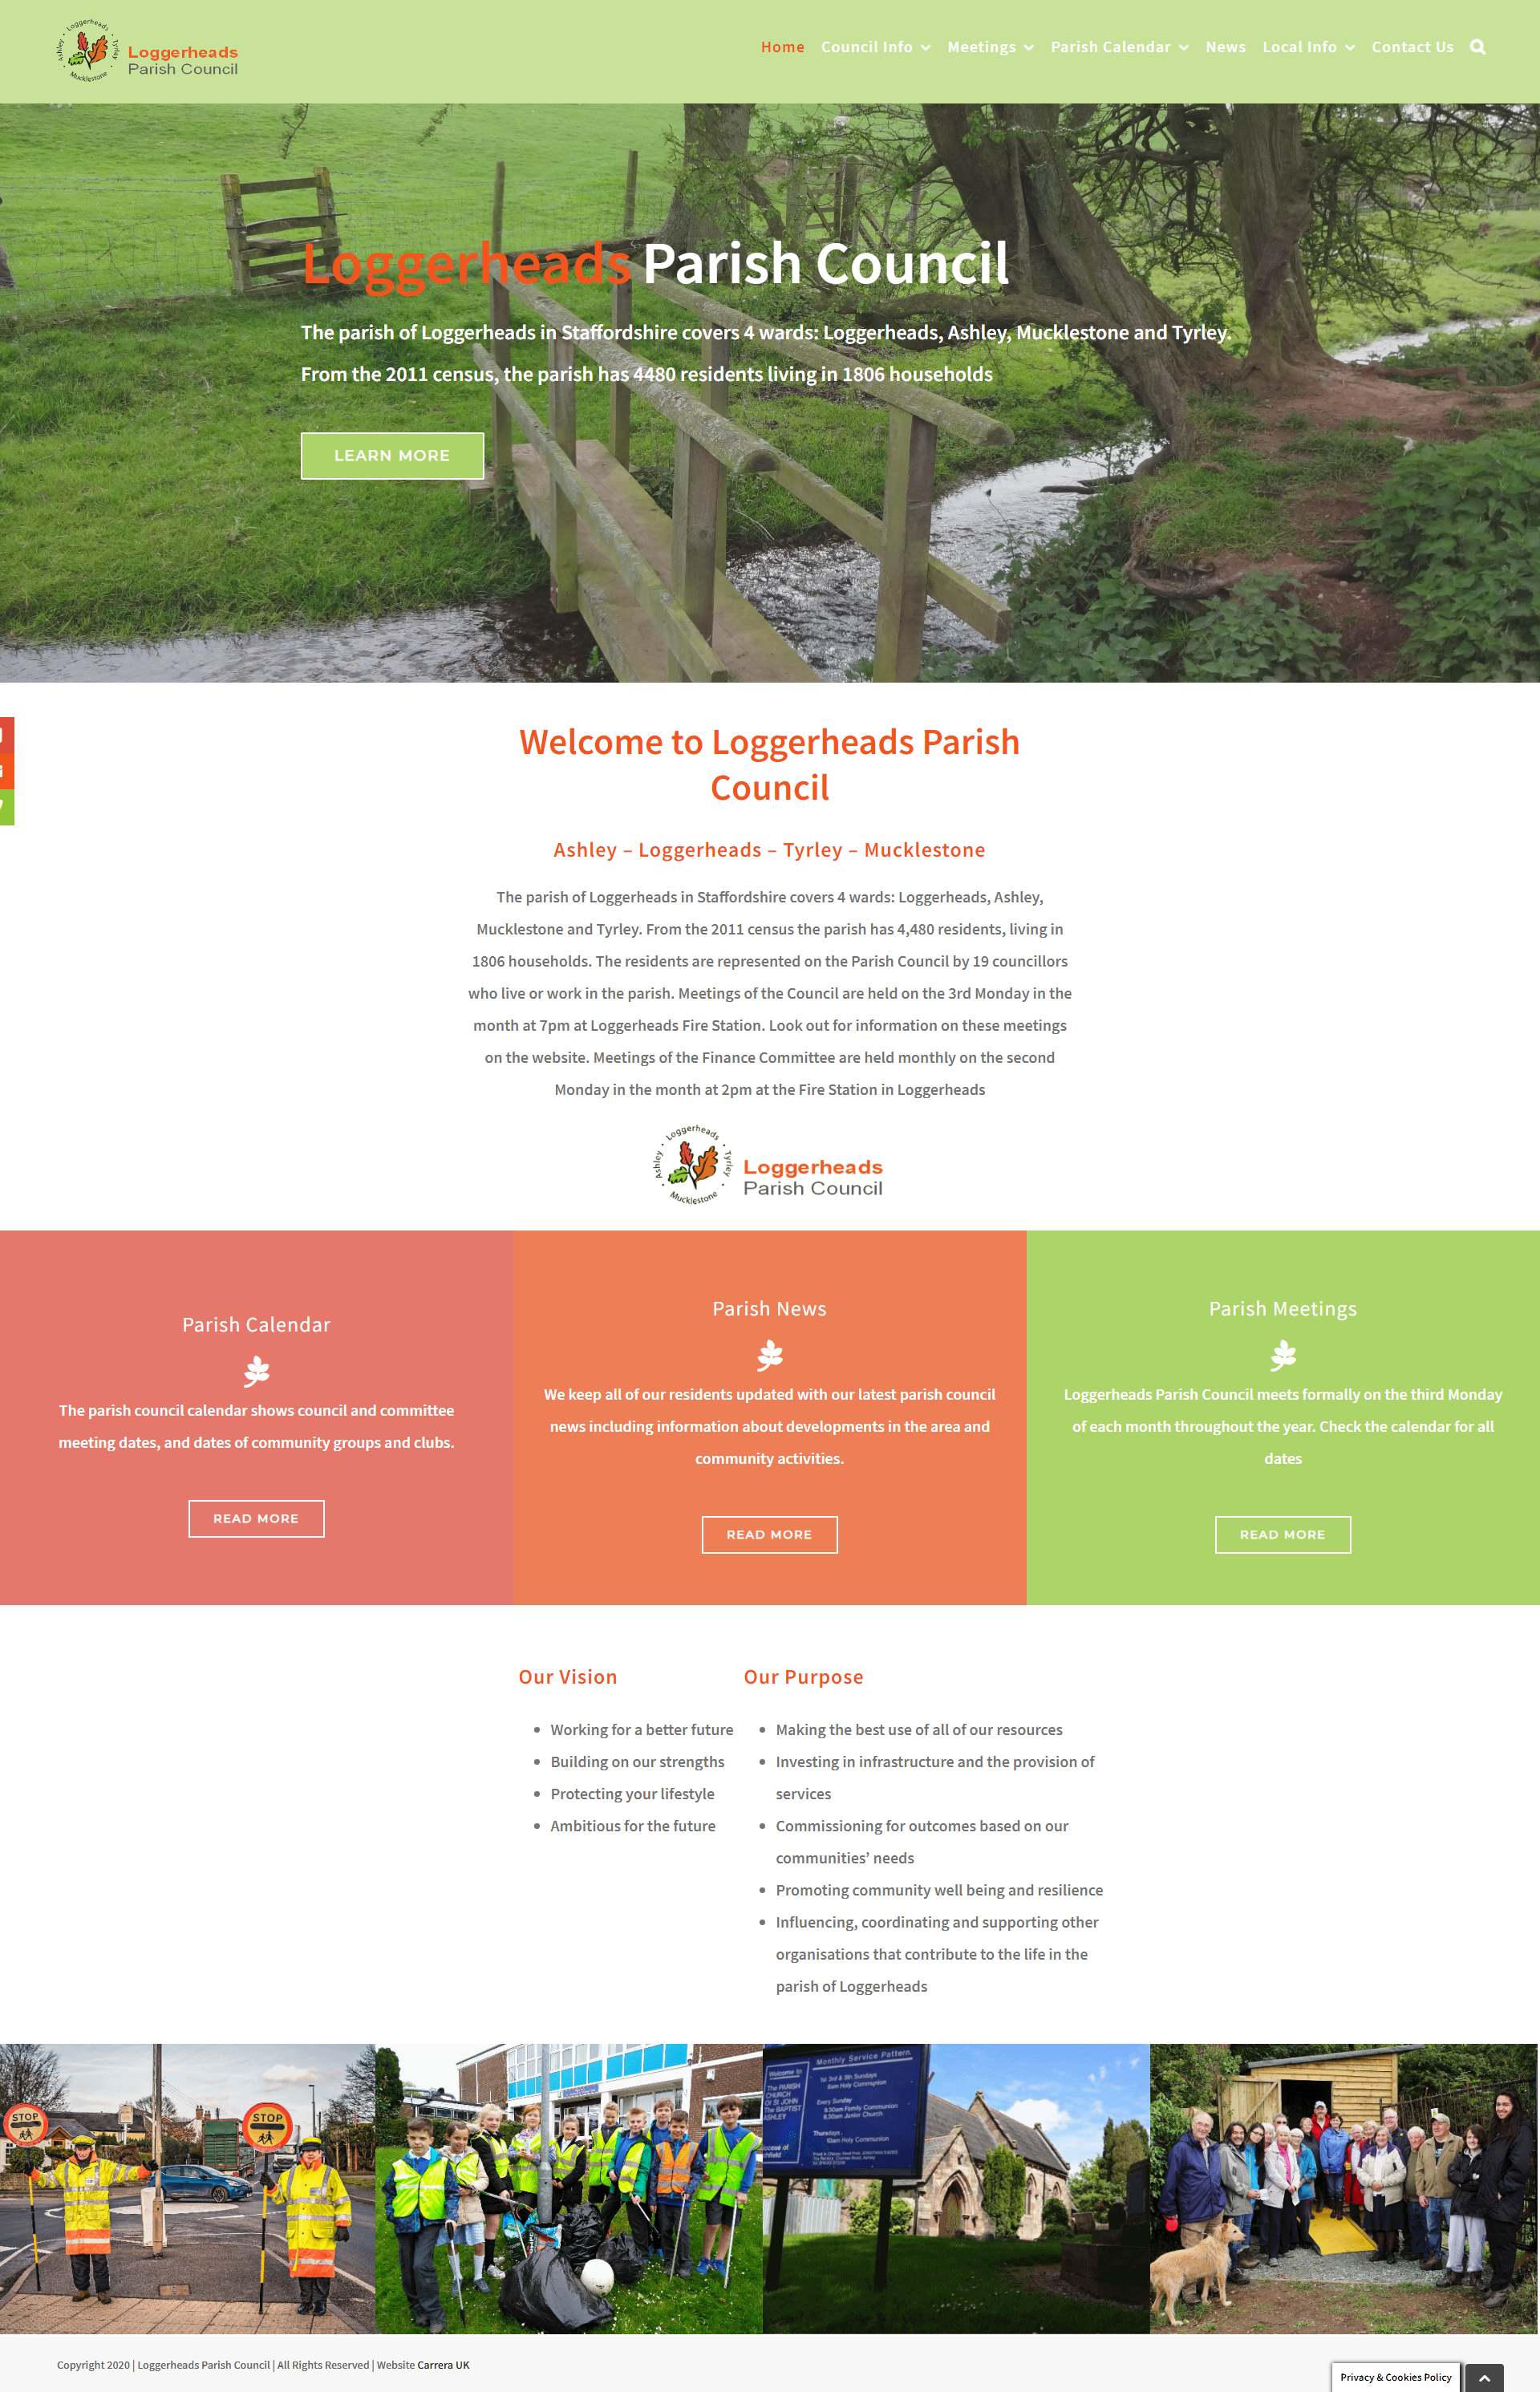 Loggerheads Parish Council Website Designed by Carrera UK